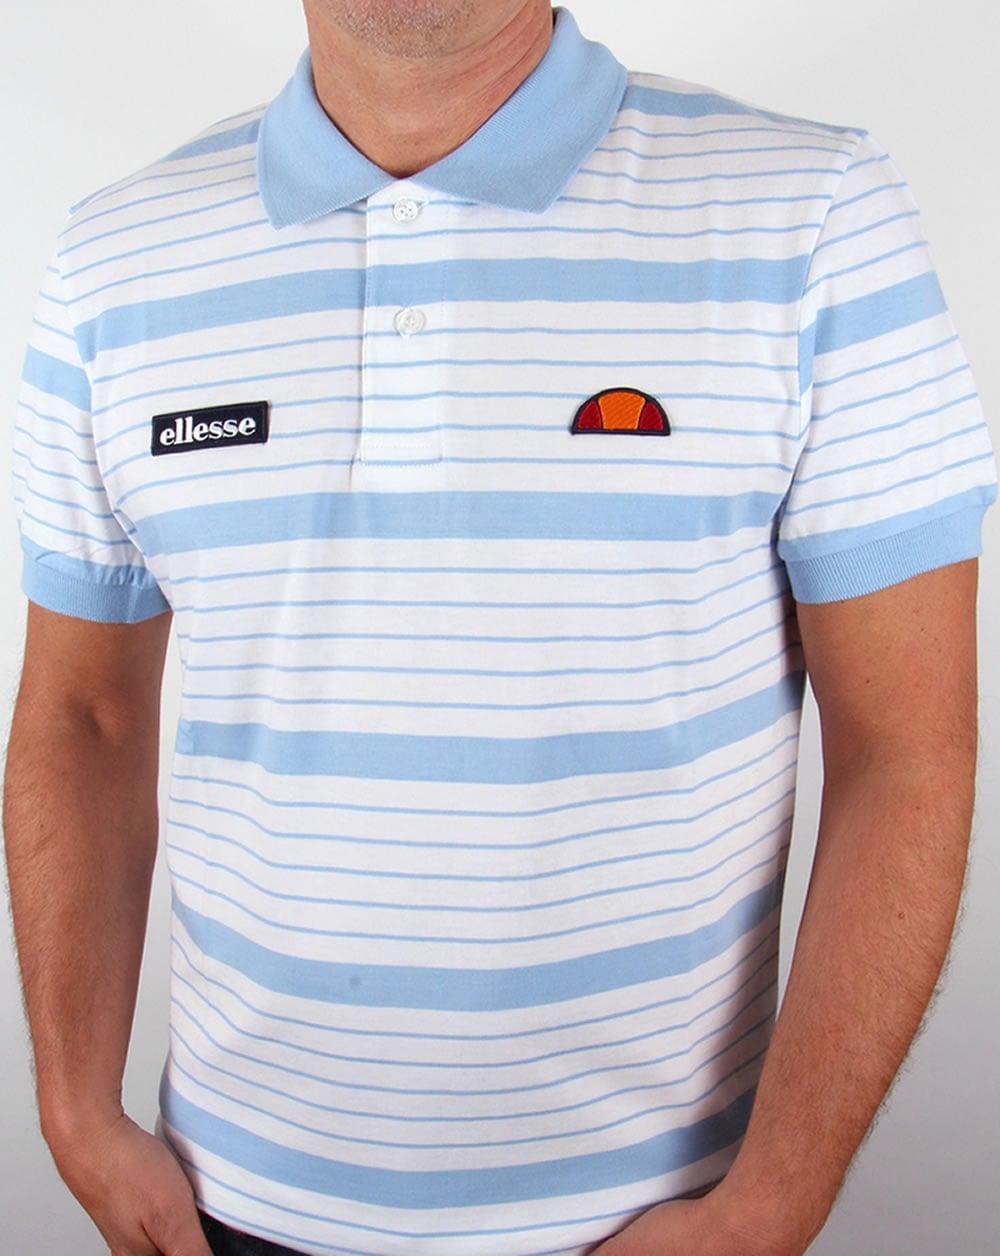 f8b7552f02 Ellesse 80s Becker Polo Shirt White/sky